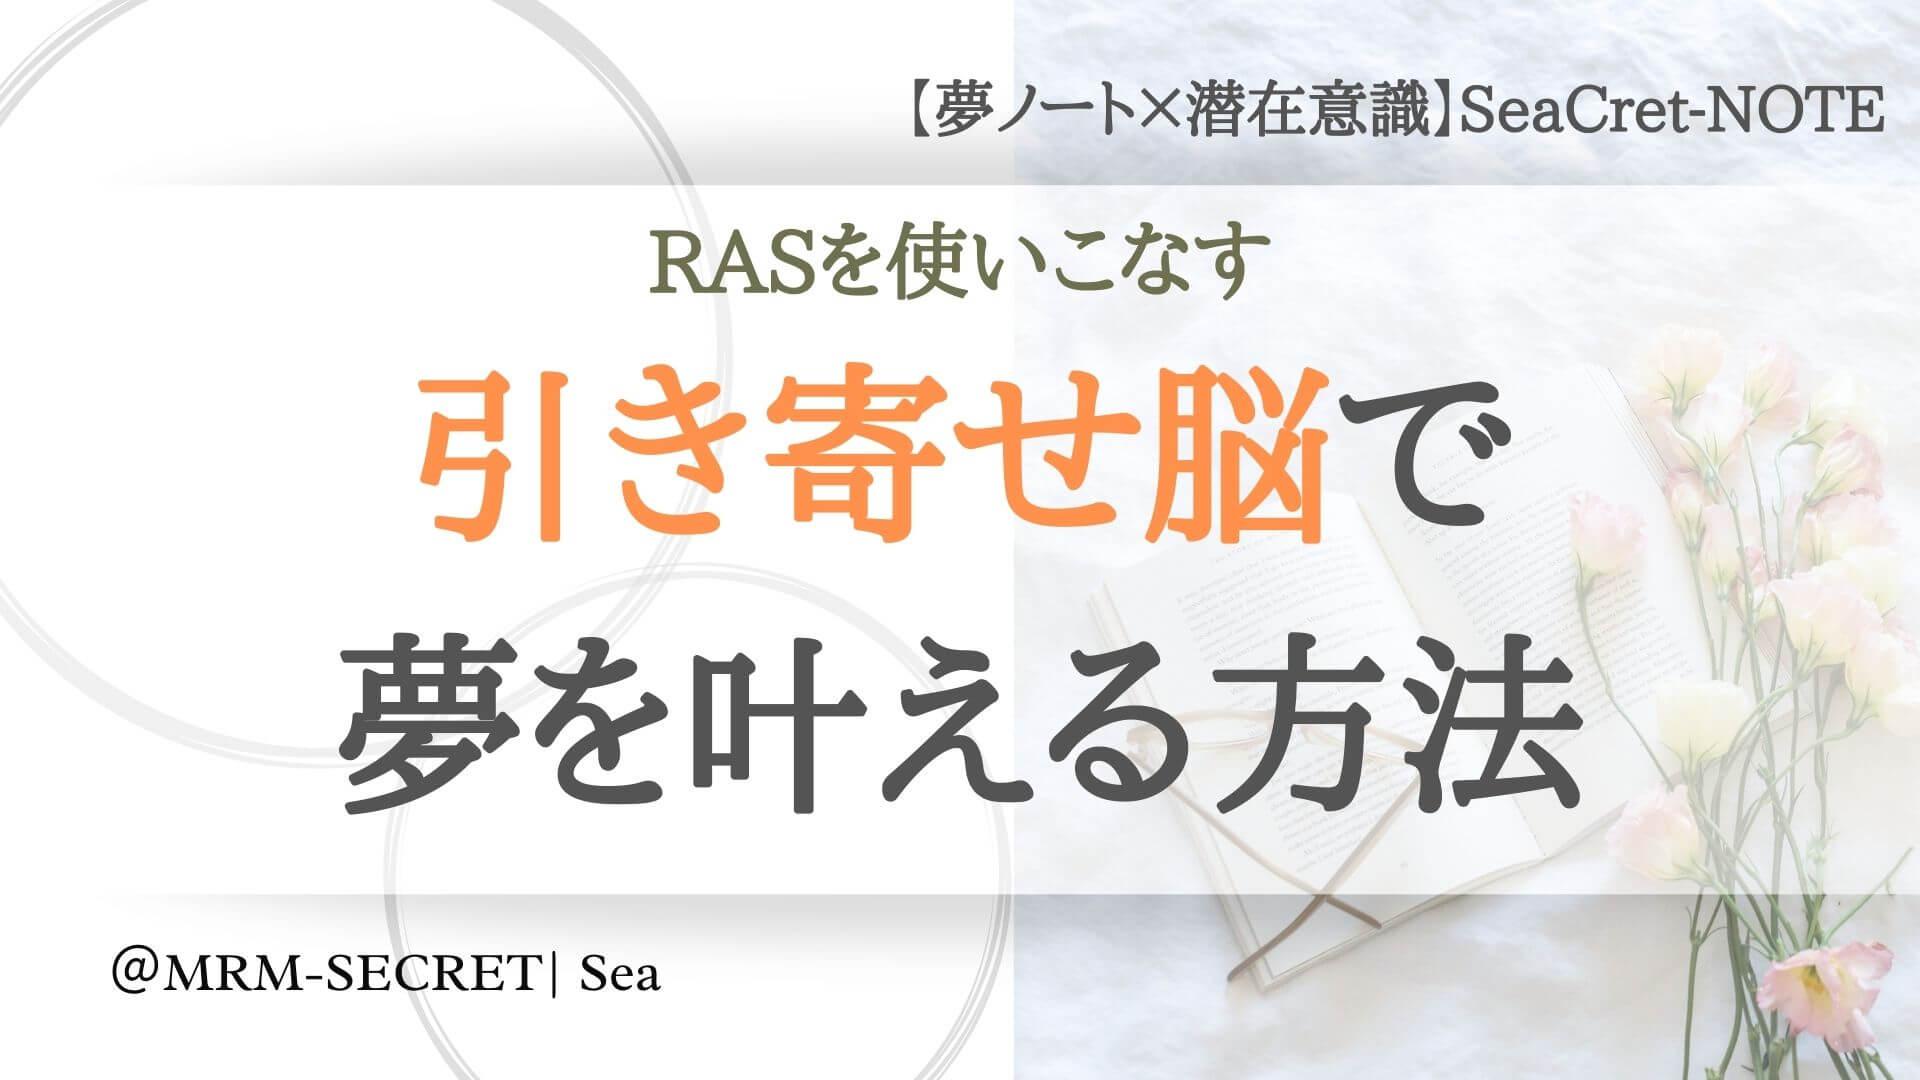 RAS(網様体賦活系)|引き寄せ脳で夢を叶える方法